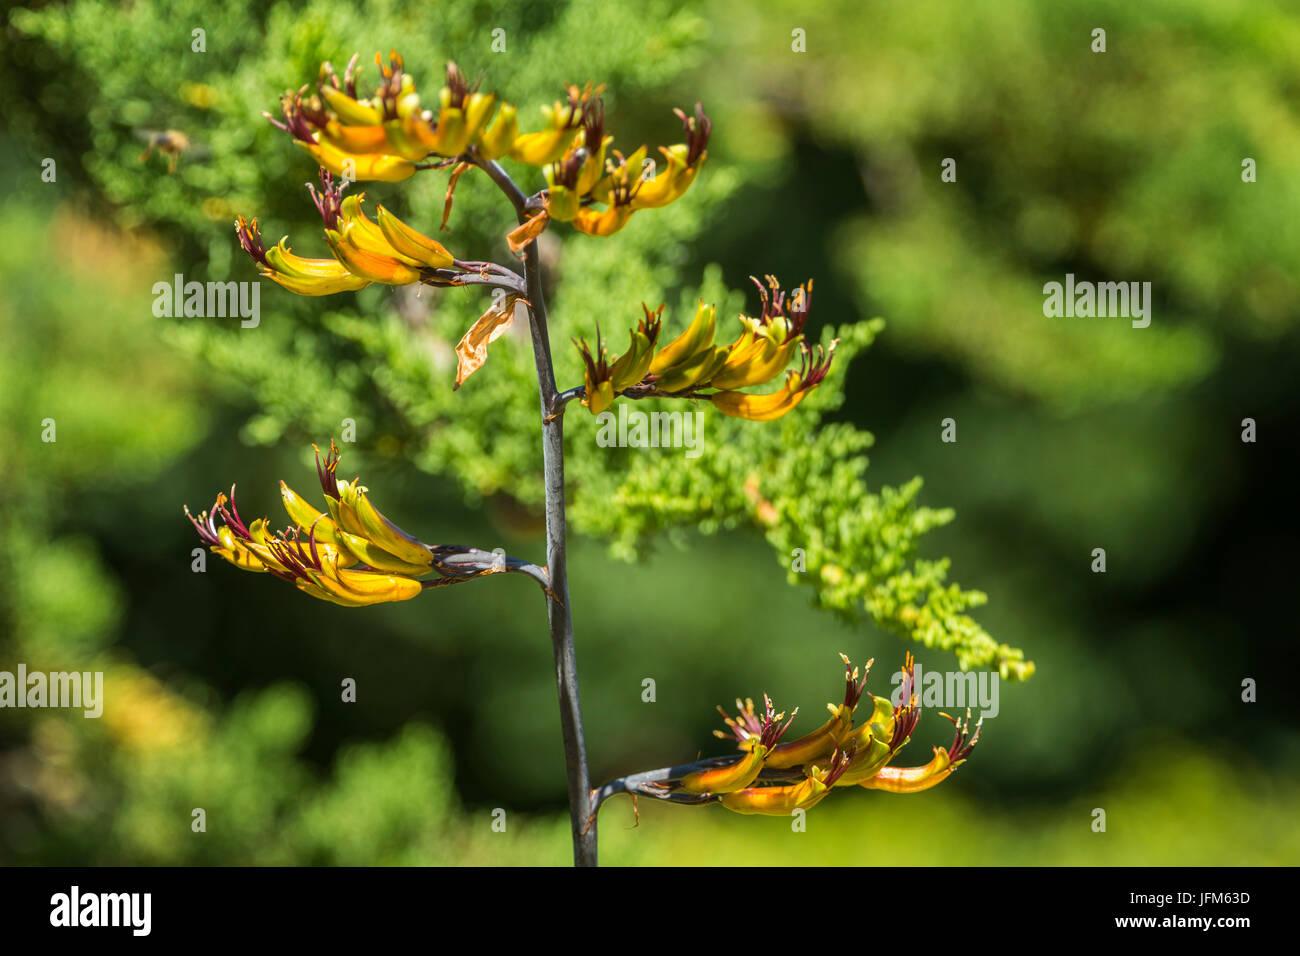 Ein Phormium Tenax Variagata in Blüte. Stockfoto